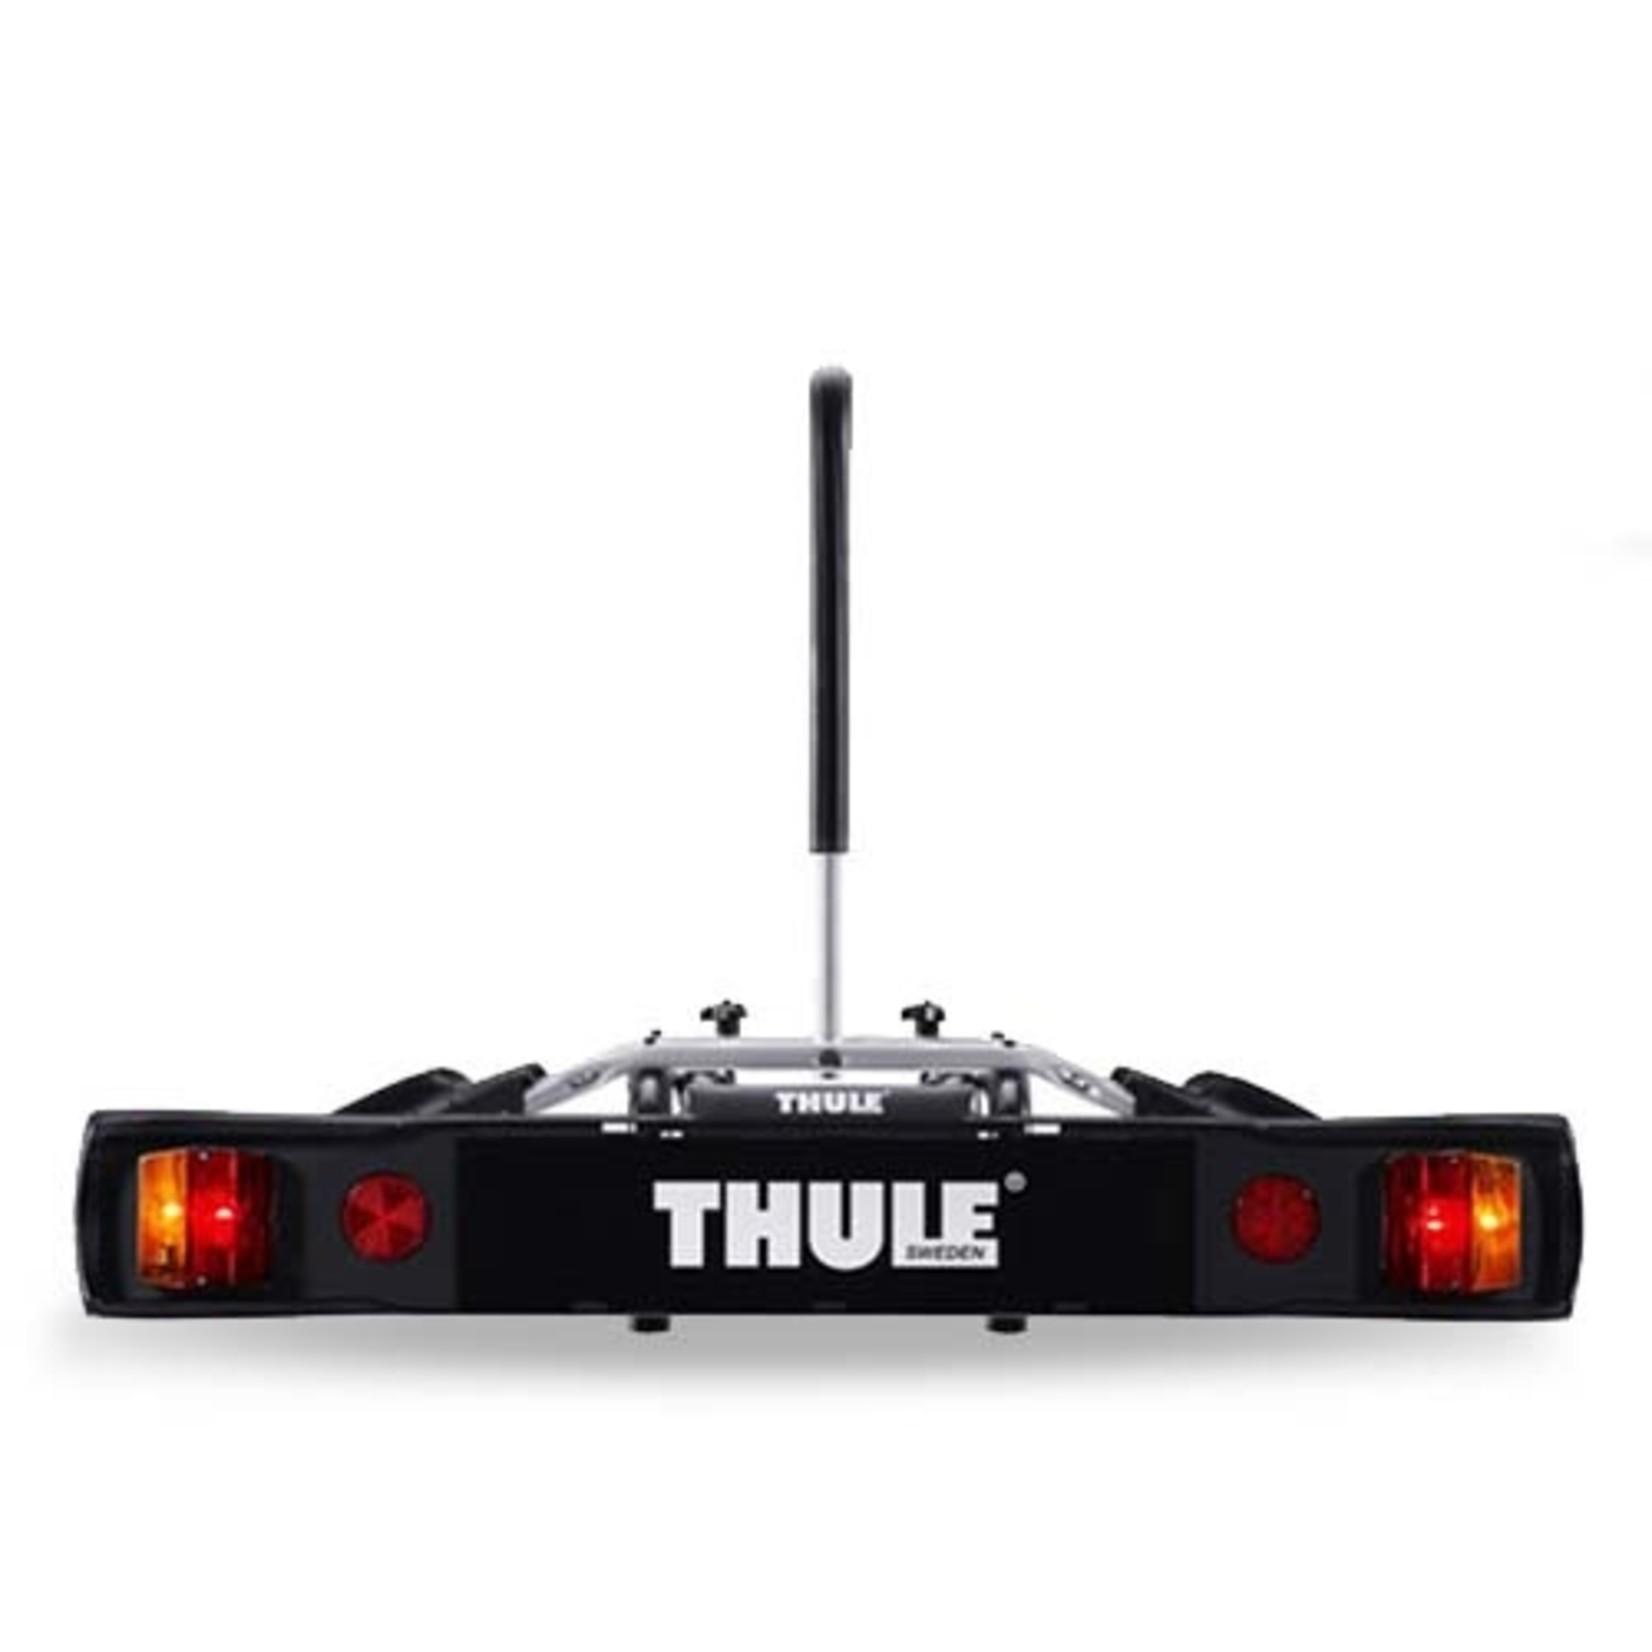 THULE THULE 9502 RIDE ON 2 BIKE TOW BAR